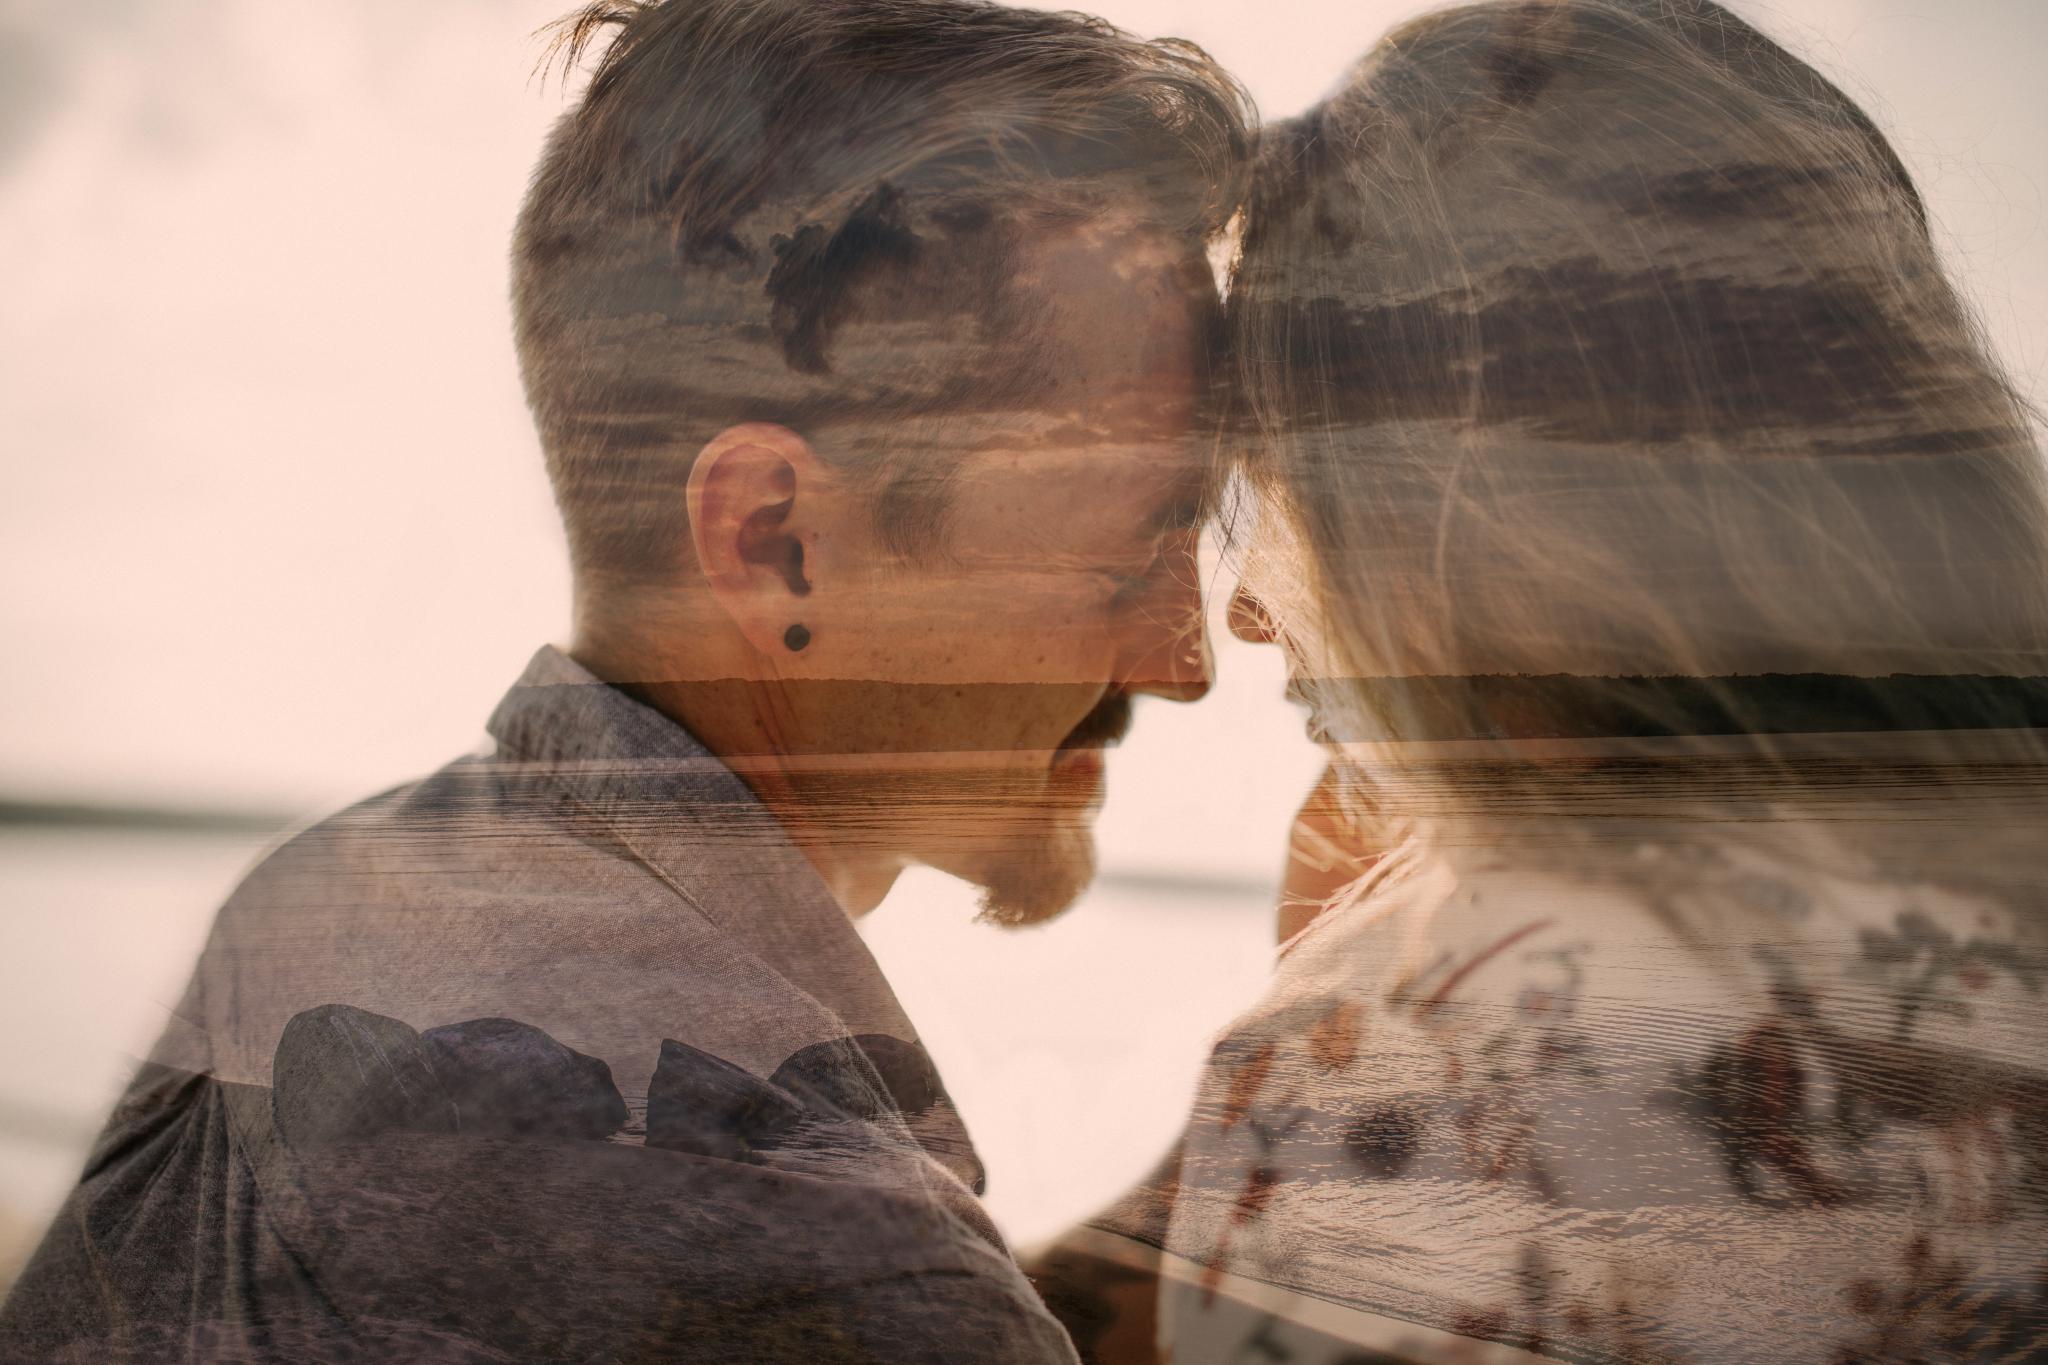 Thunder Beach Engagement  |  Courtney + Mikey